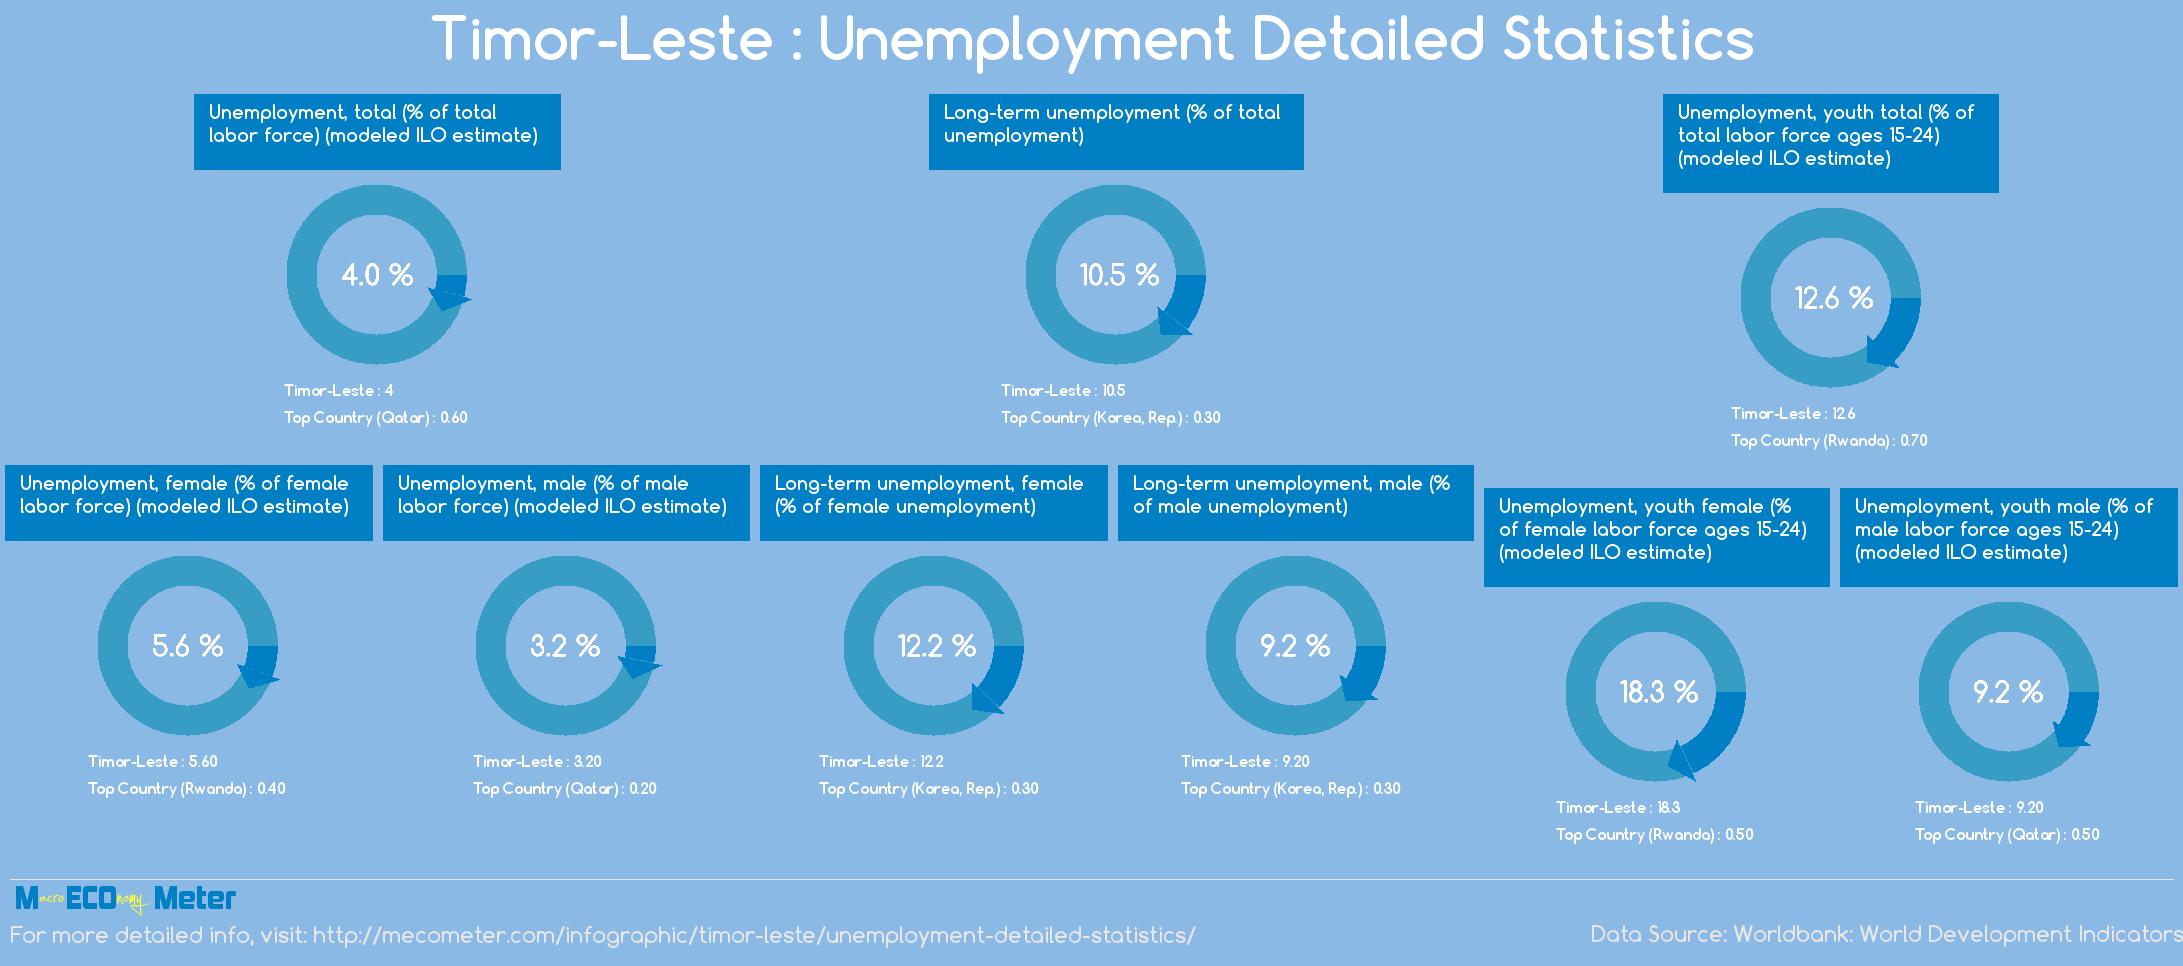 Timor-Leste : Unemployment Detailed Statistics